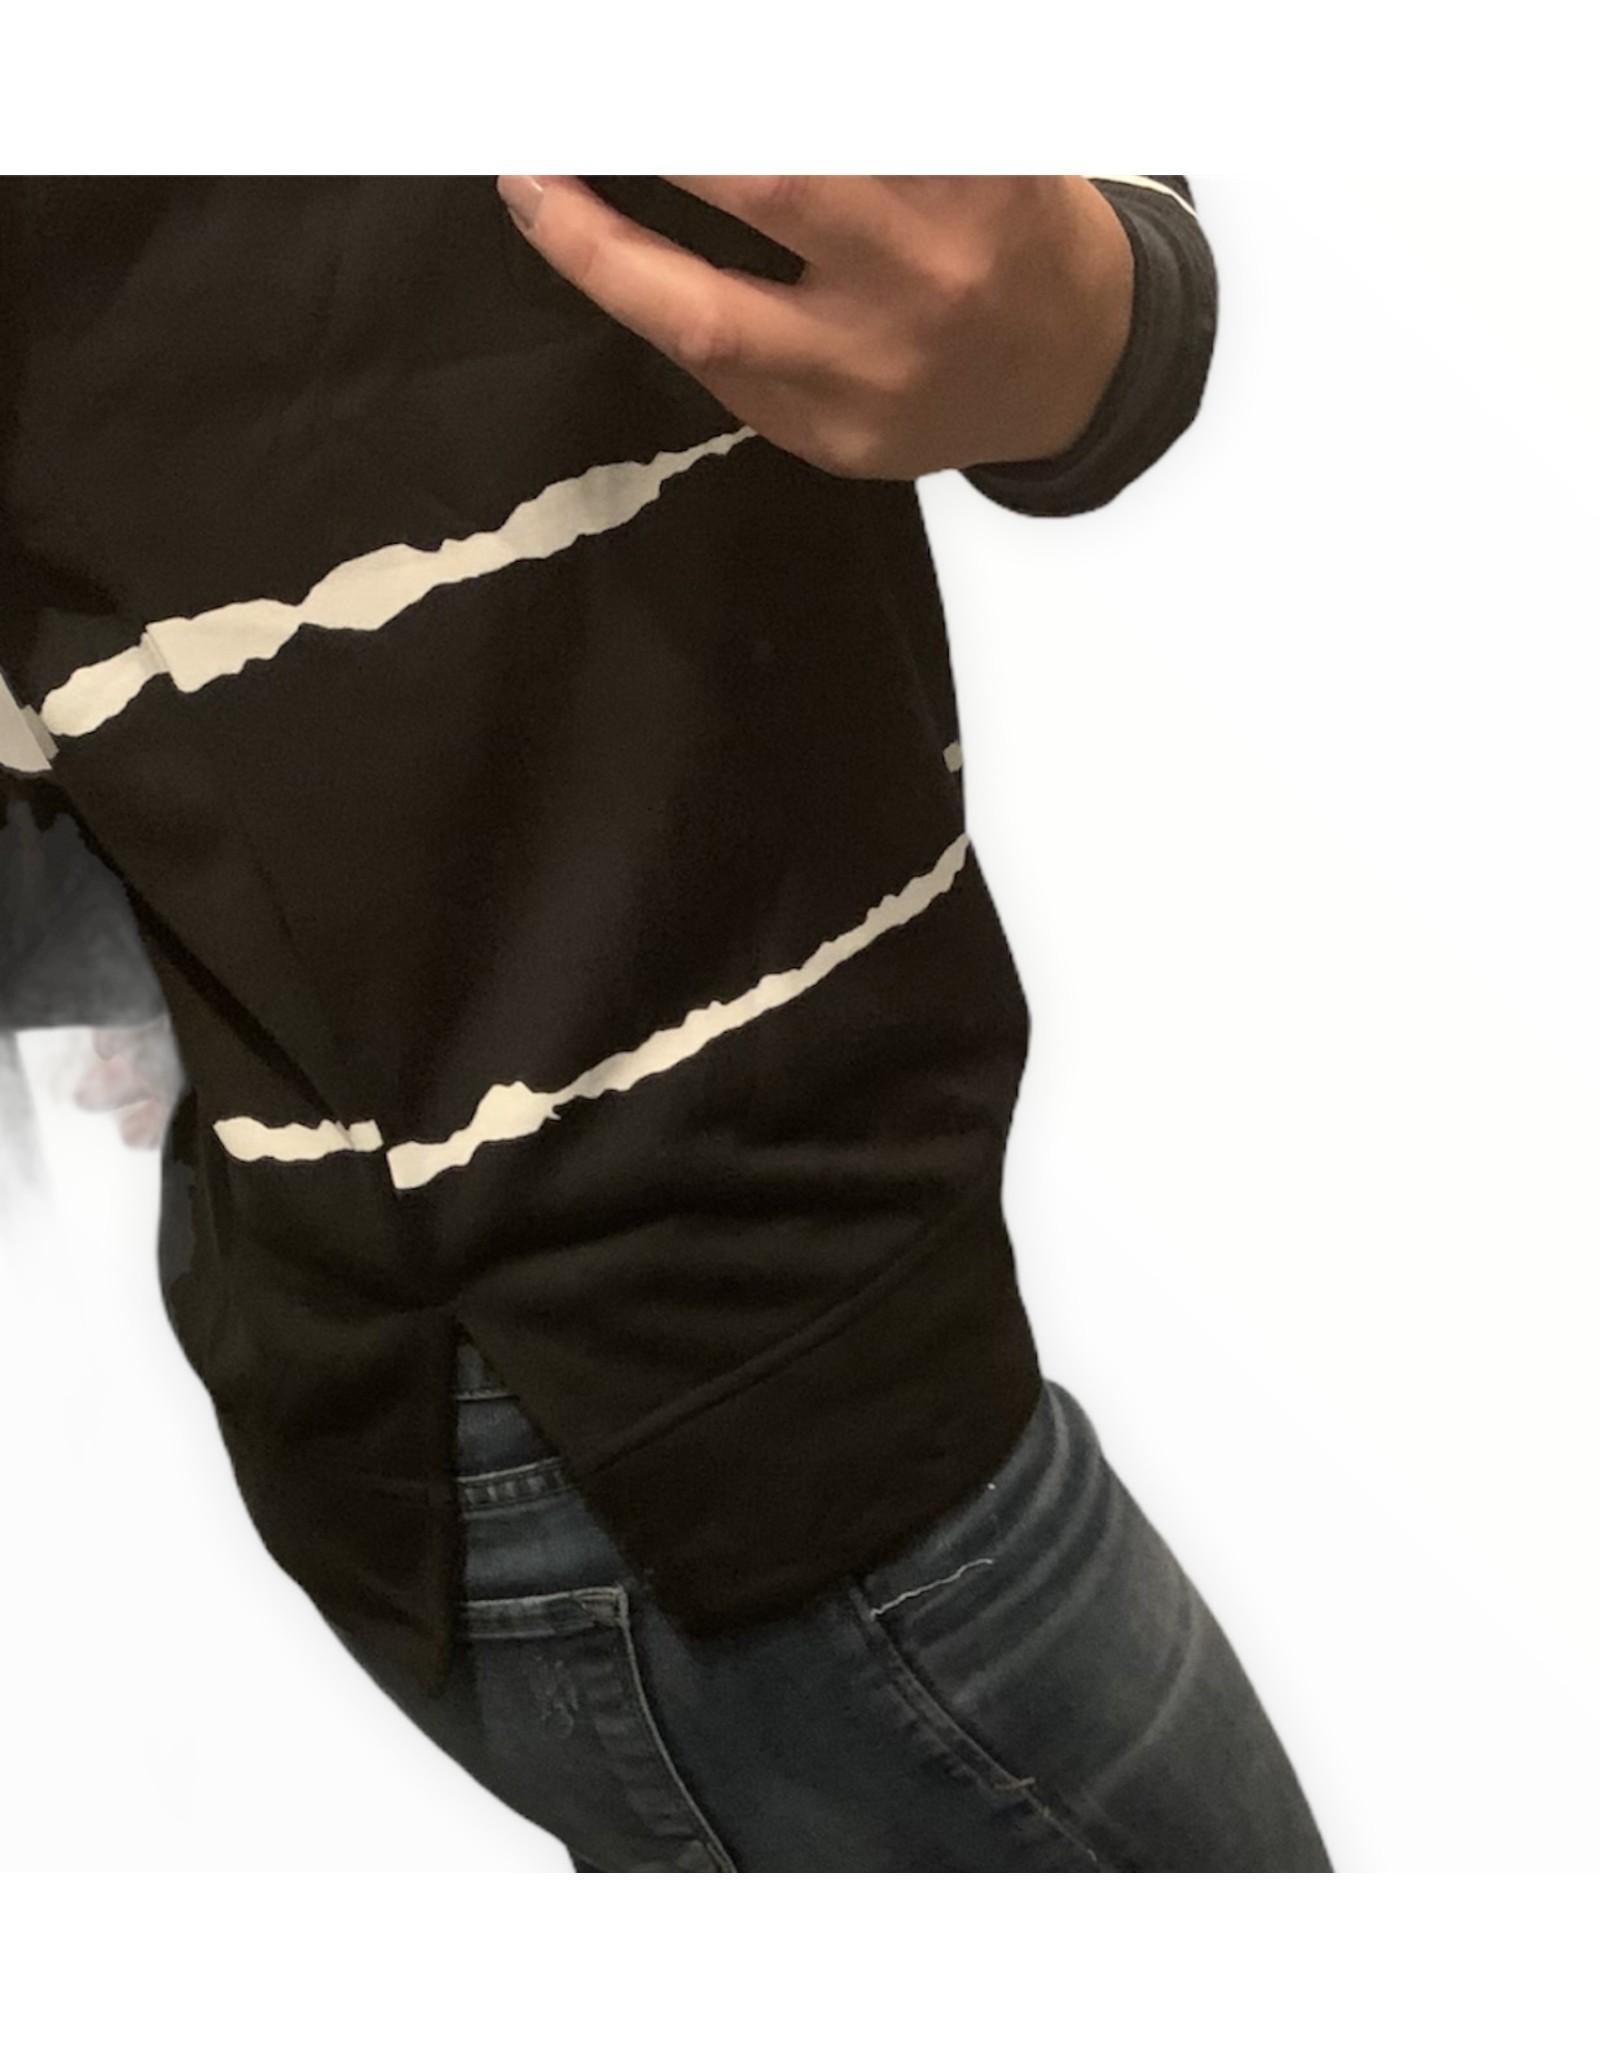 LATA Black and white stripe sweatshirt